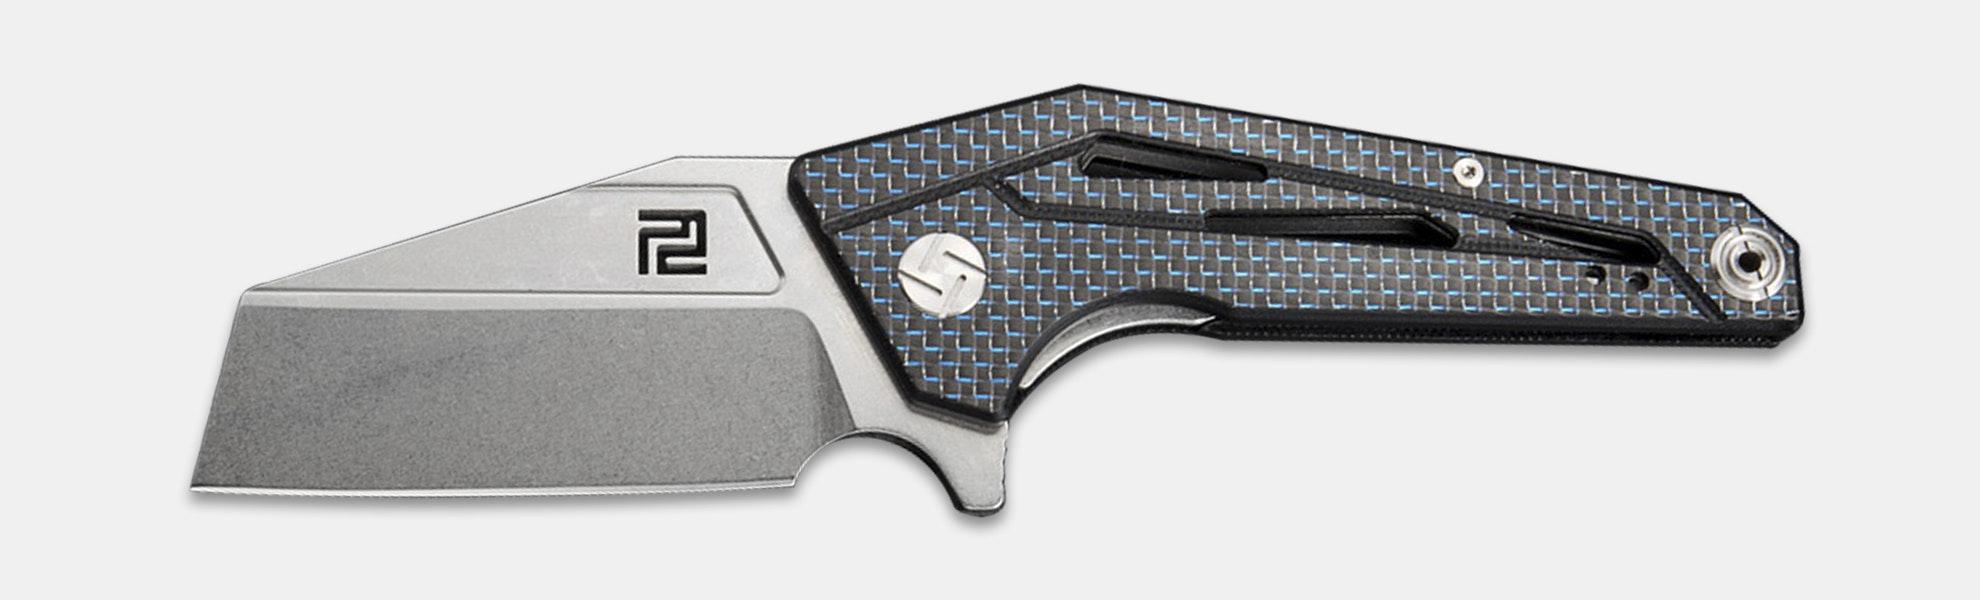 Artisan Cutlery Ravine Folding Knife